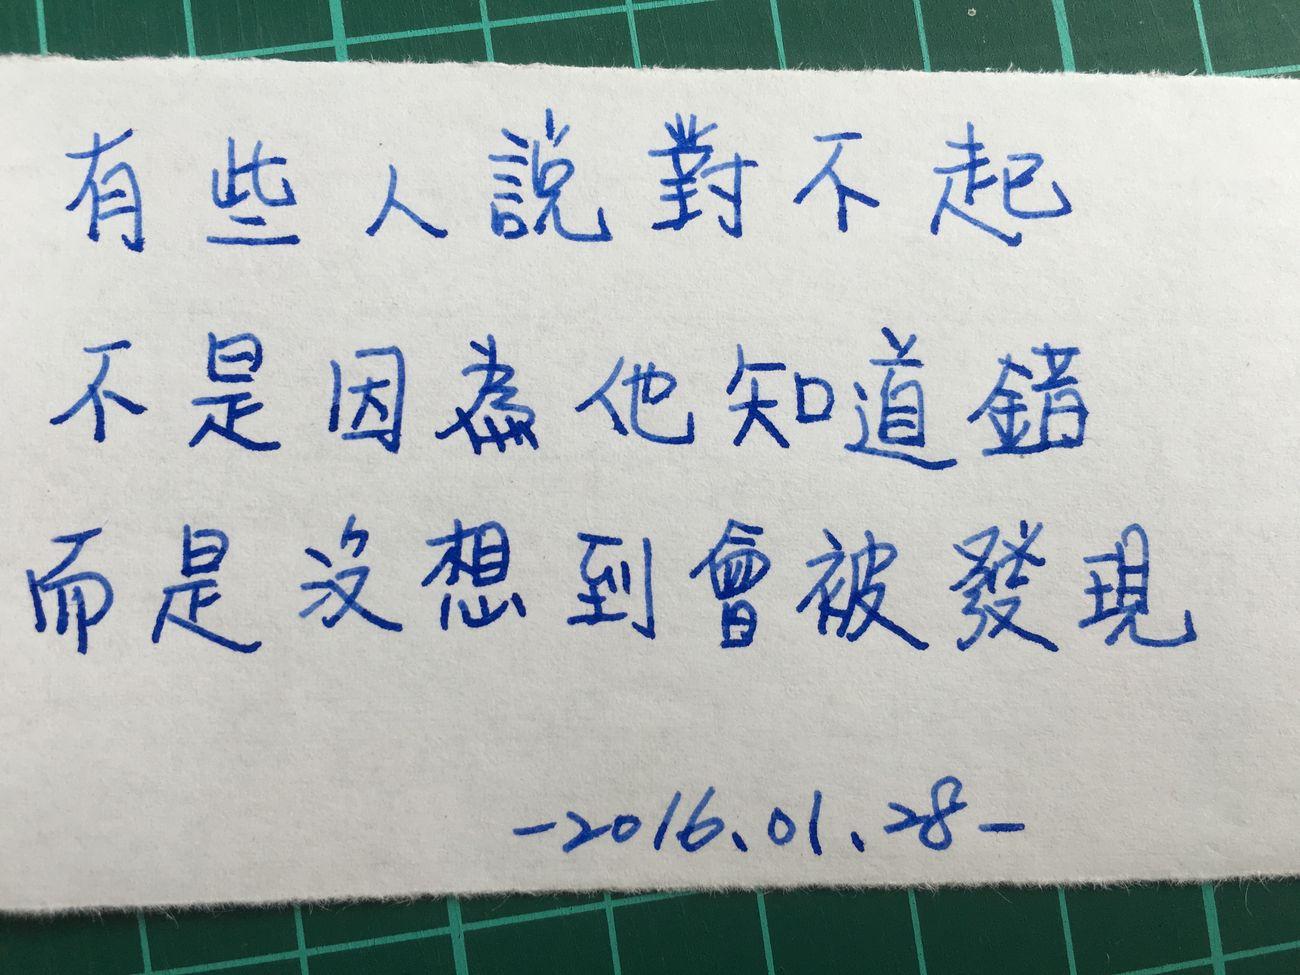 Taiwanese Kaohsiung 高雄 鋼筆 臺灣 一月 Taiwan 文具 中文 January 前鎮區 墨水 Lamy